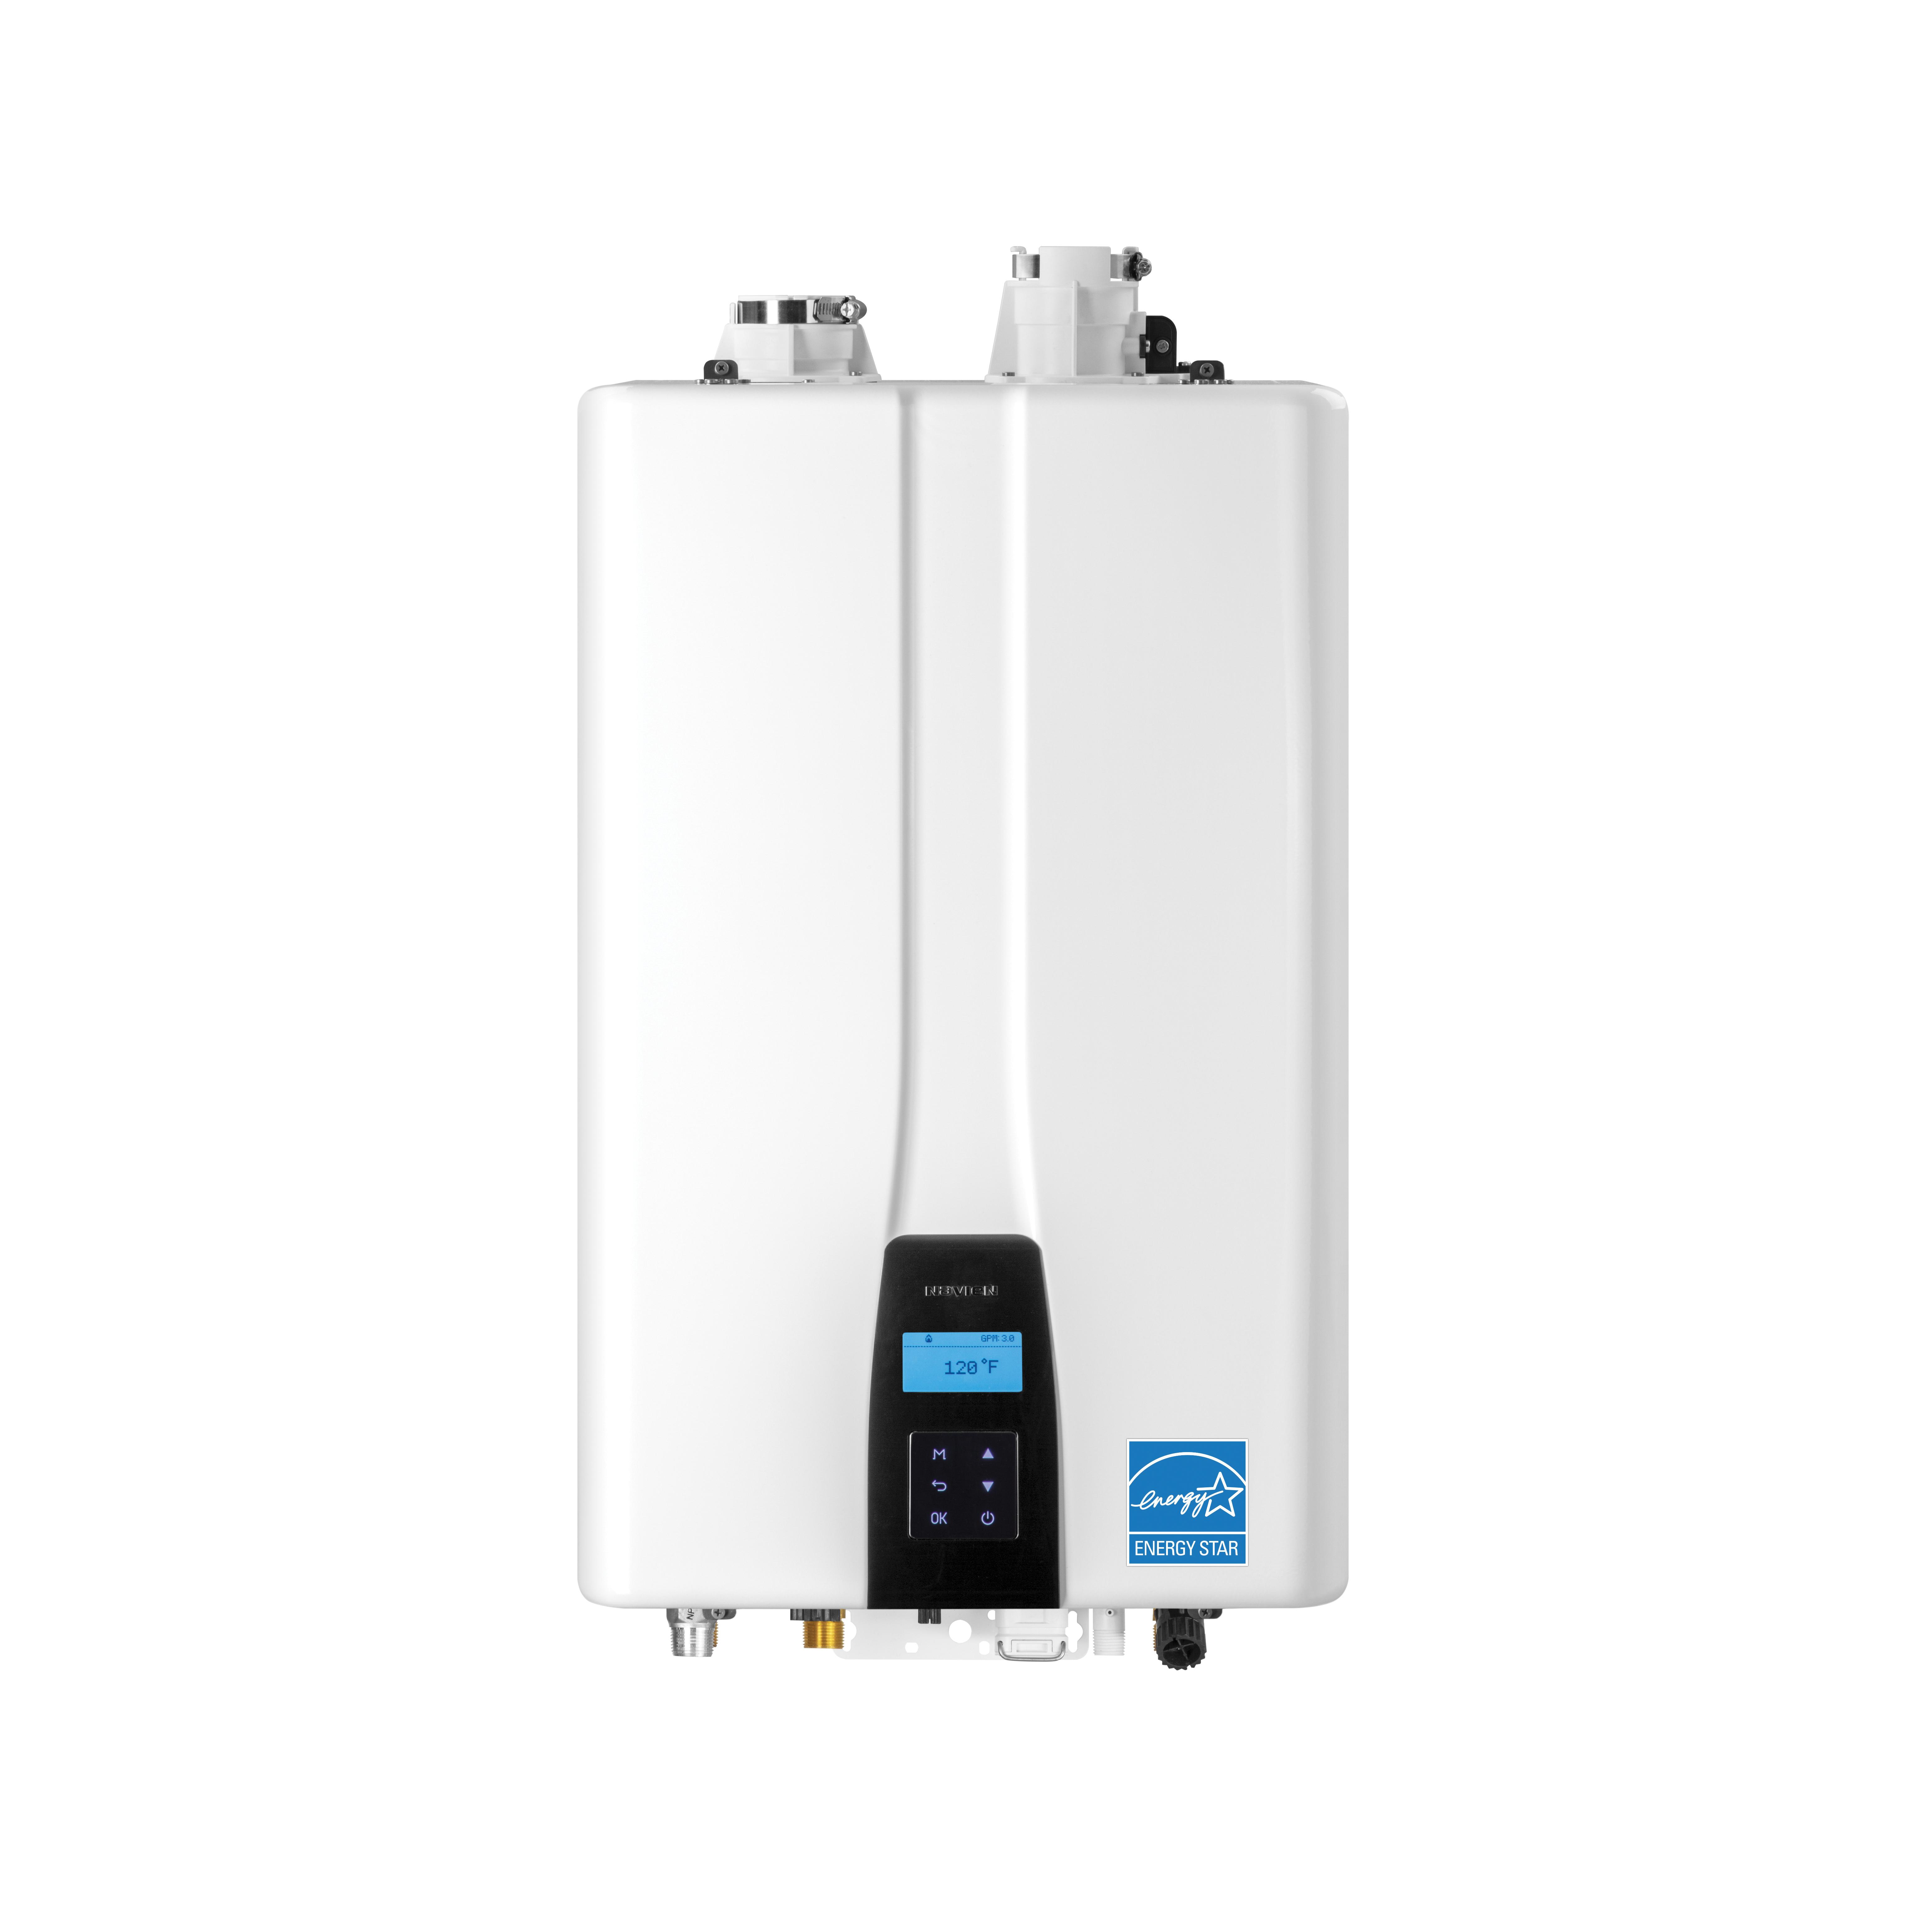 KD Navien® NPE-150S2 NPE-S2 Series High Efficiency Premium Standard Tankless Gas Water Heater, Natural Gas/Liquid Propane Fuel, 18000 to 120000 Btu/hr Heating, Indoor/Outdoor: Indoor/Outdoor, Condensing, 6.8 gpm at 35 deg F Flow Rate, 2 in Vent, Dual